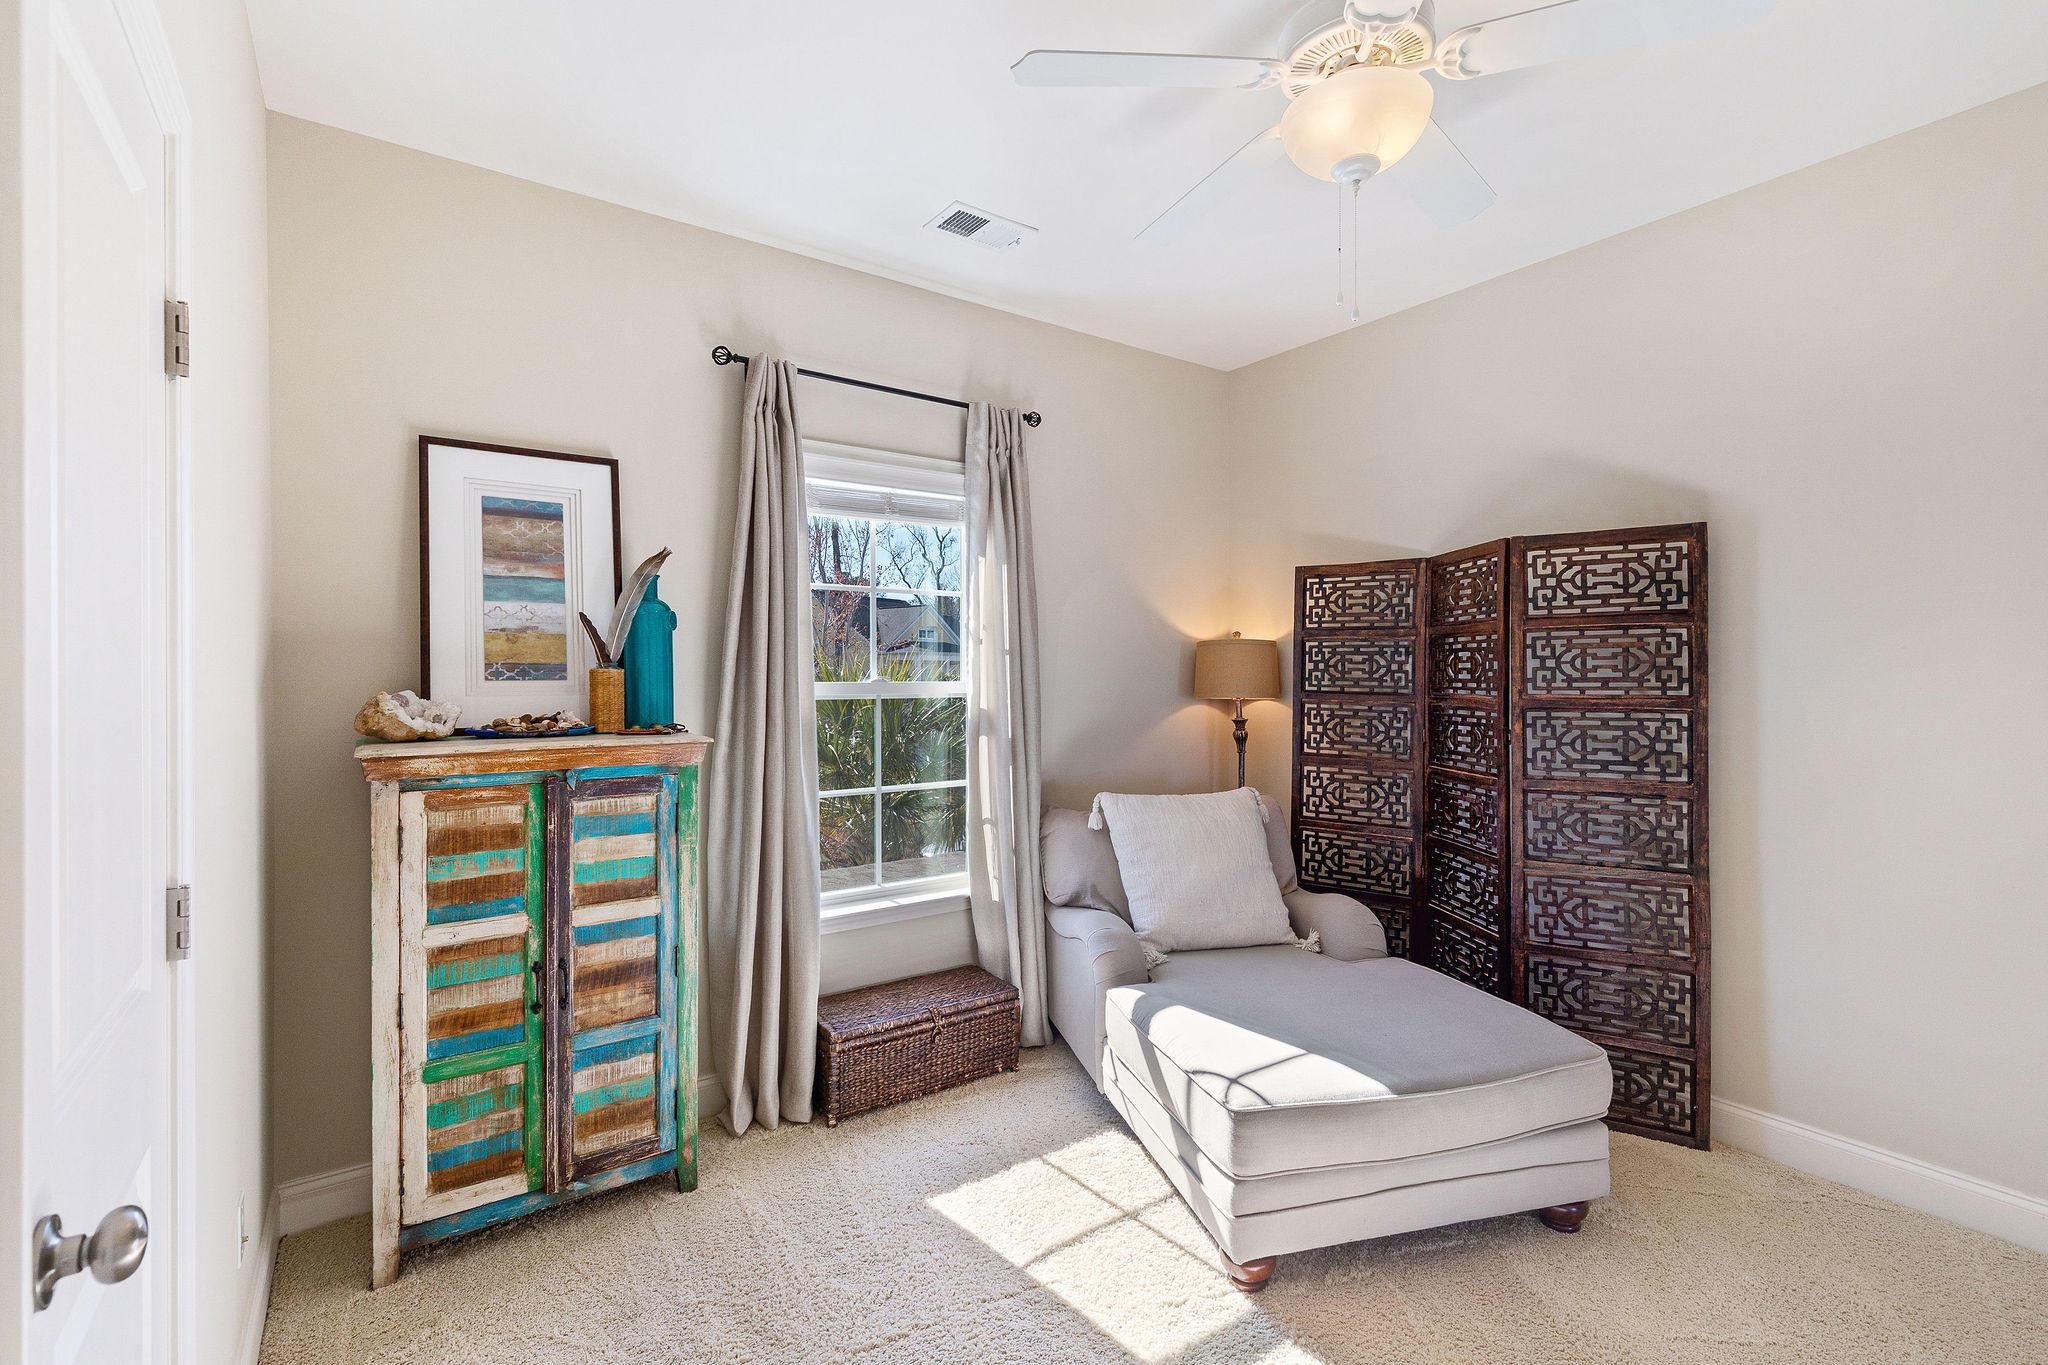 Dunes West Homes For Sale - 3212 Hatchway, Mount Pleasant, SC - 53